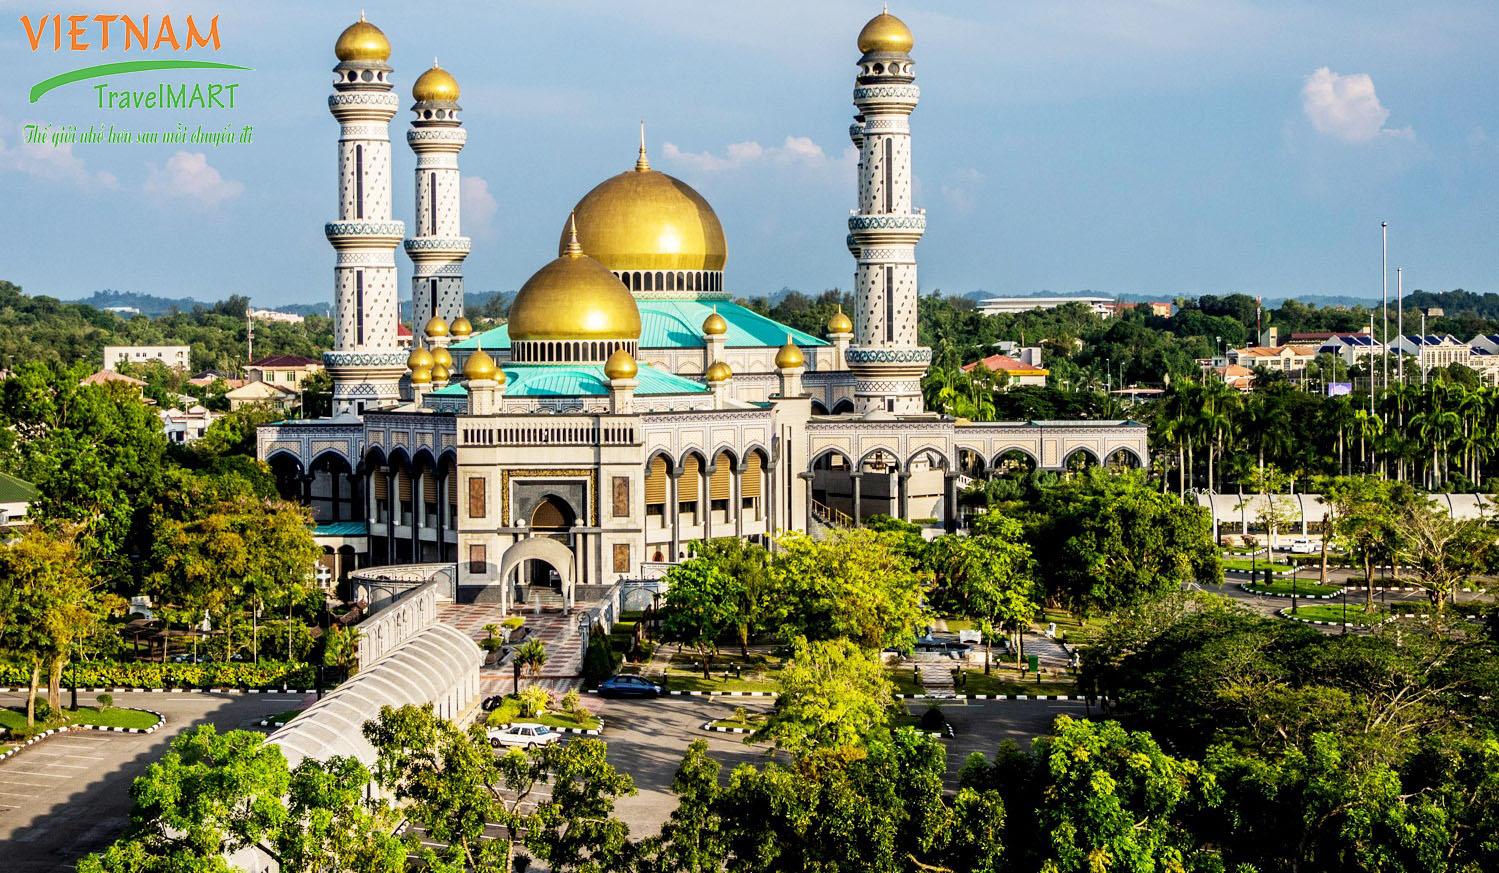 Thánh đường Hồi giáo Jame's Asr Hassanil Bolkiah Mosque